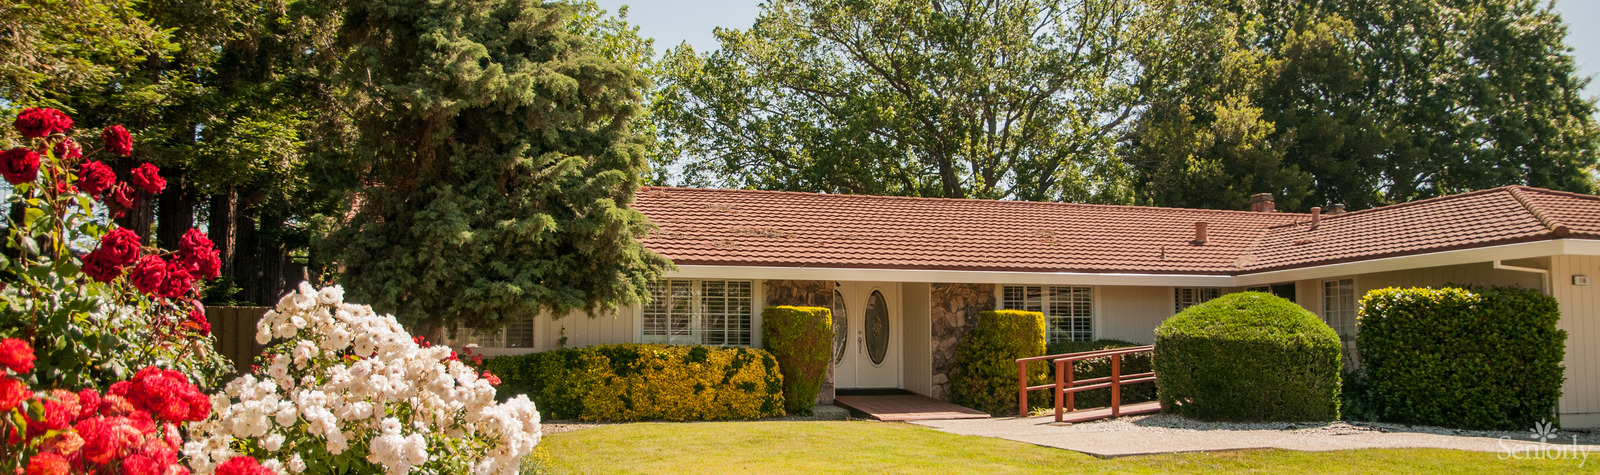 Abraham Rest Home (116 Via Monte) Walnut Creek CA 4